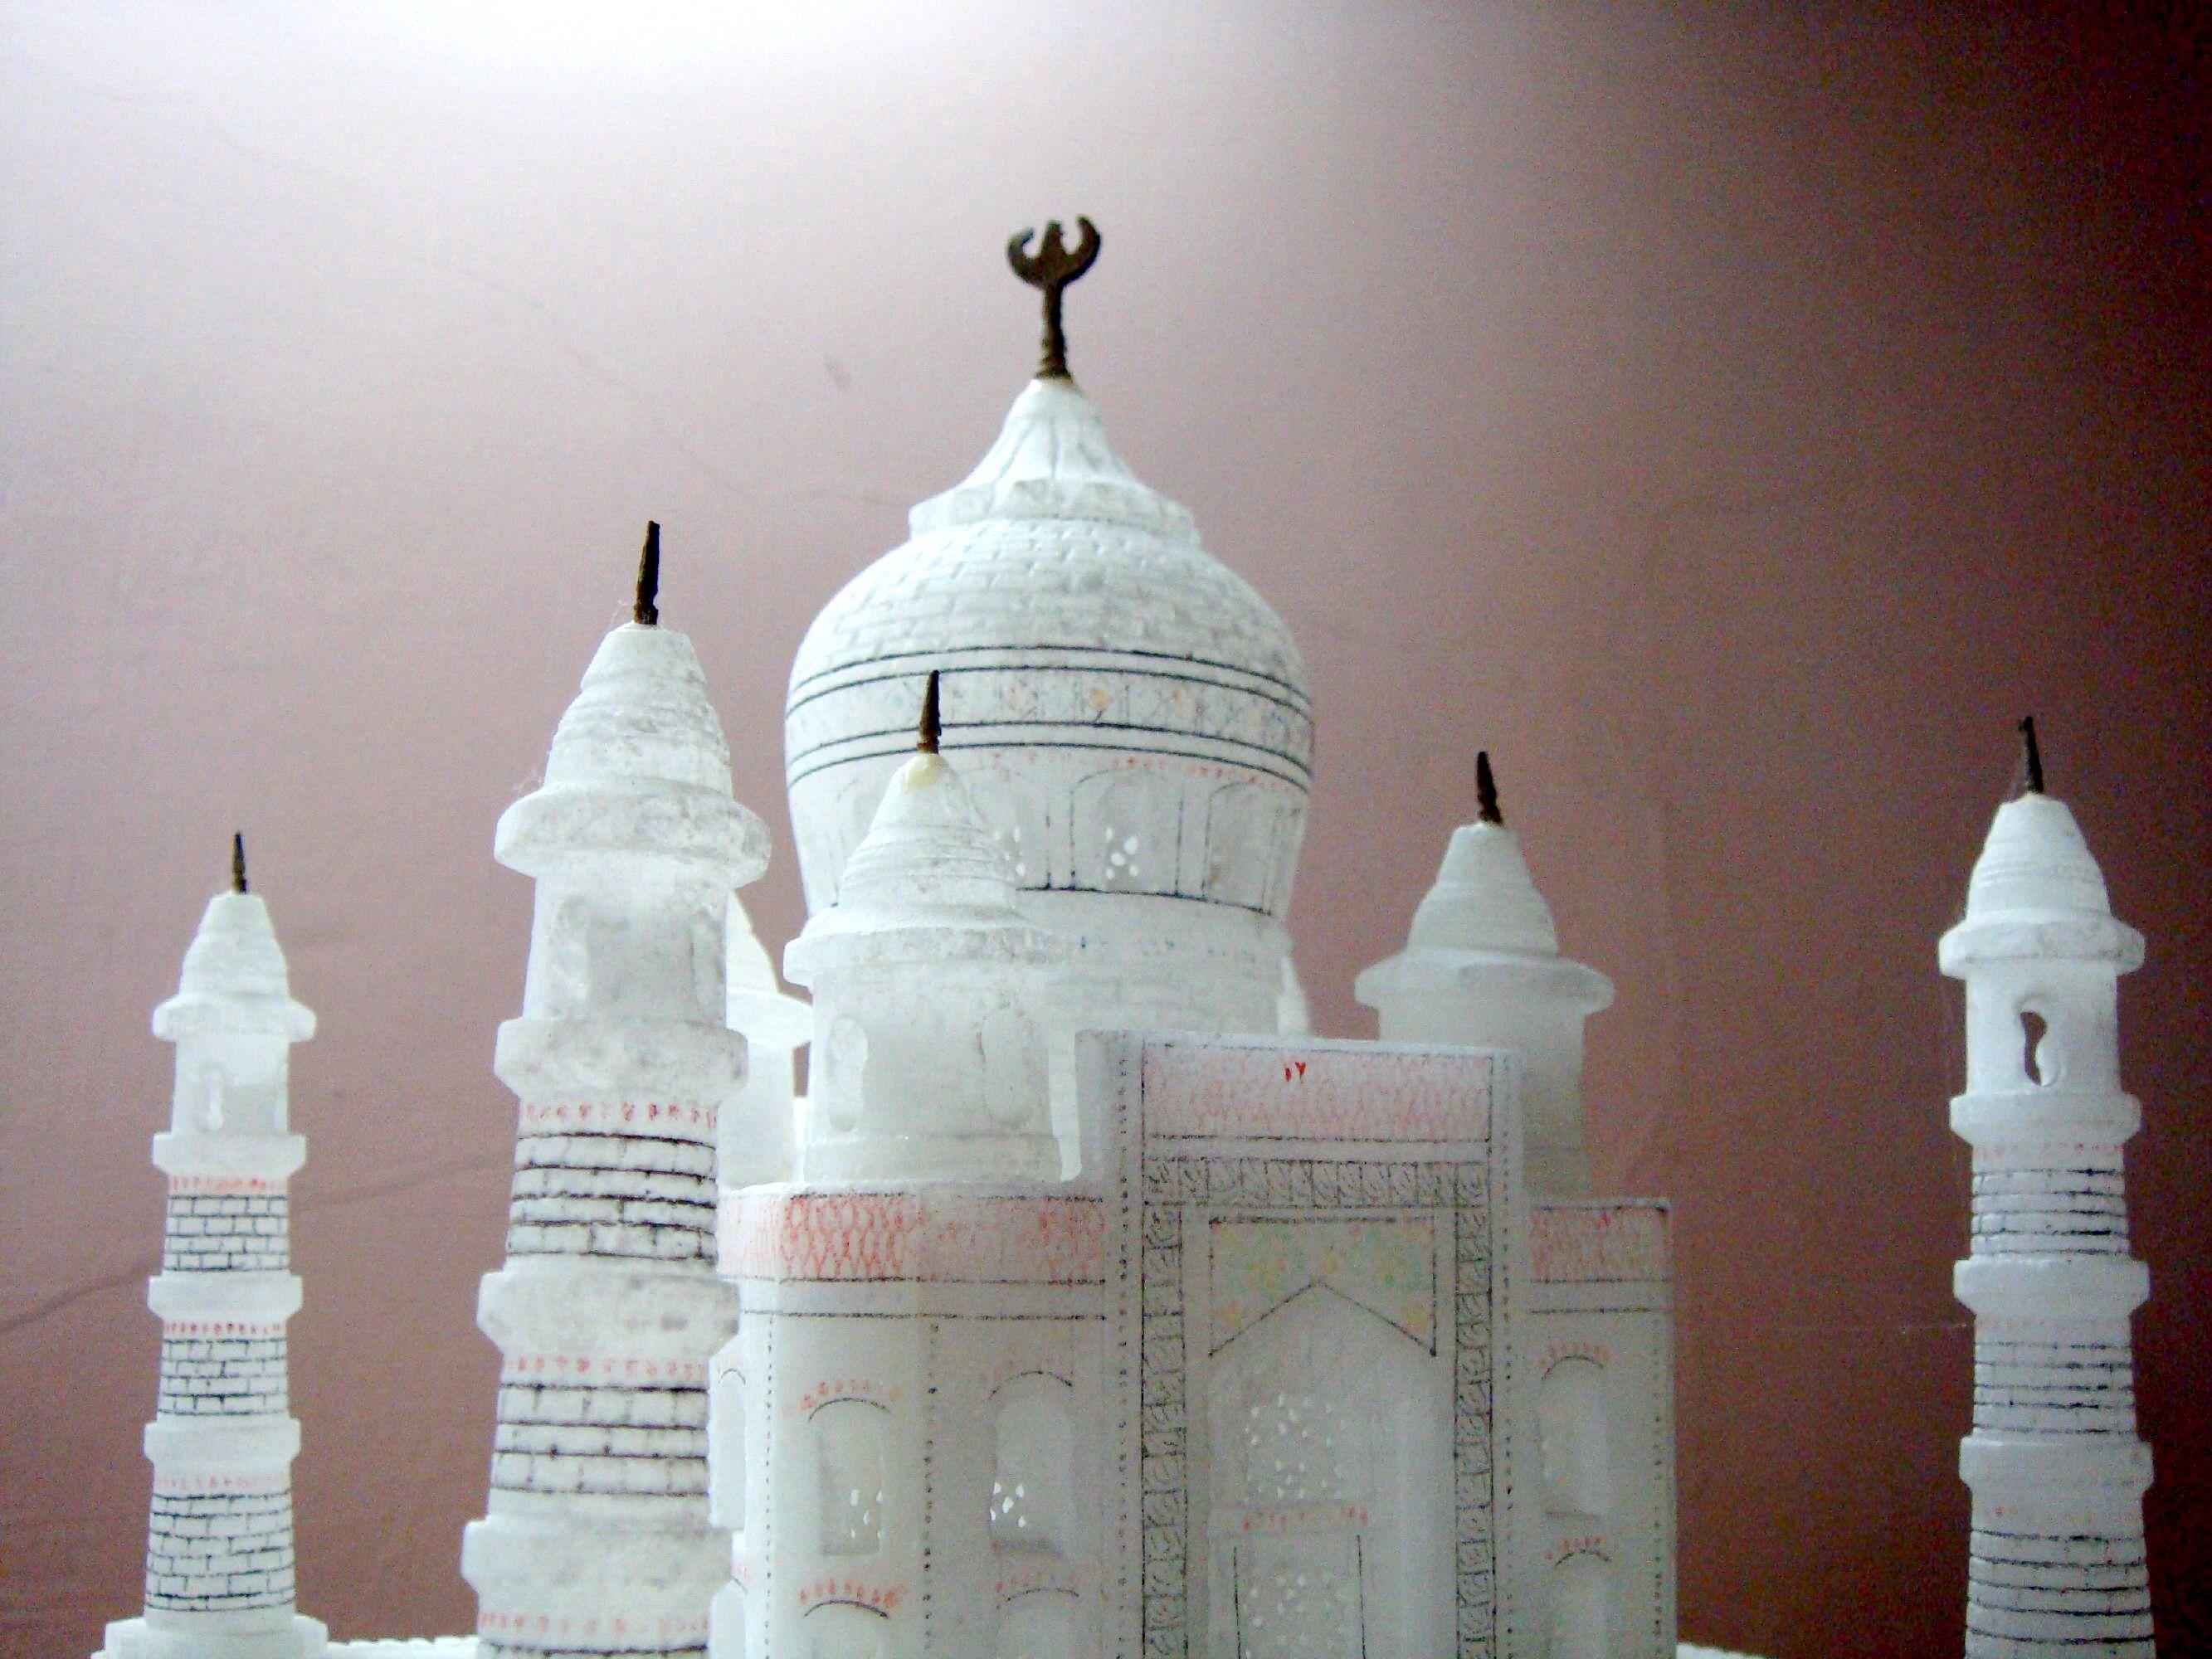 Taj Mahal, Candles, Dome, Mahal, Miniature, HQ Photo